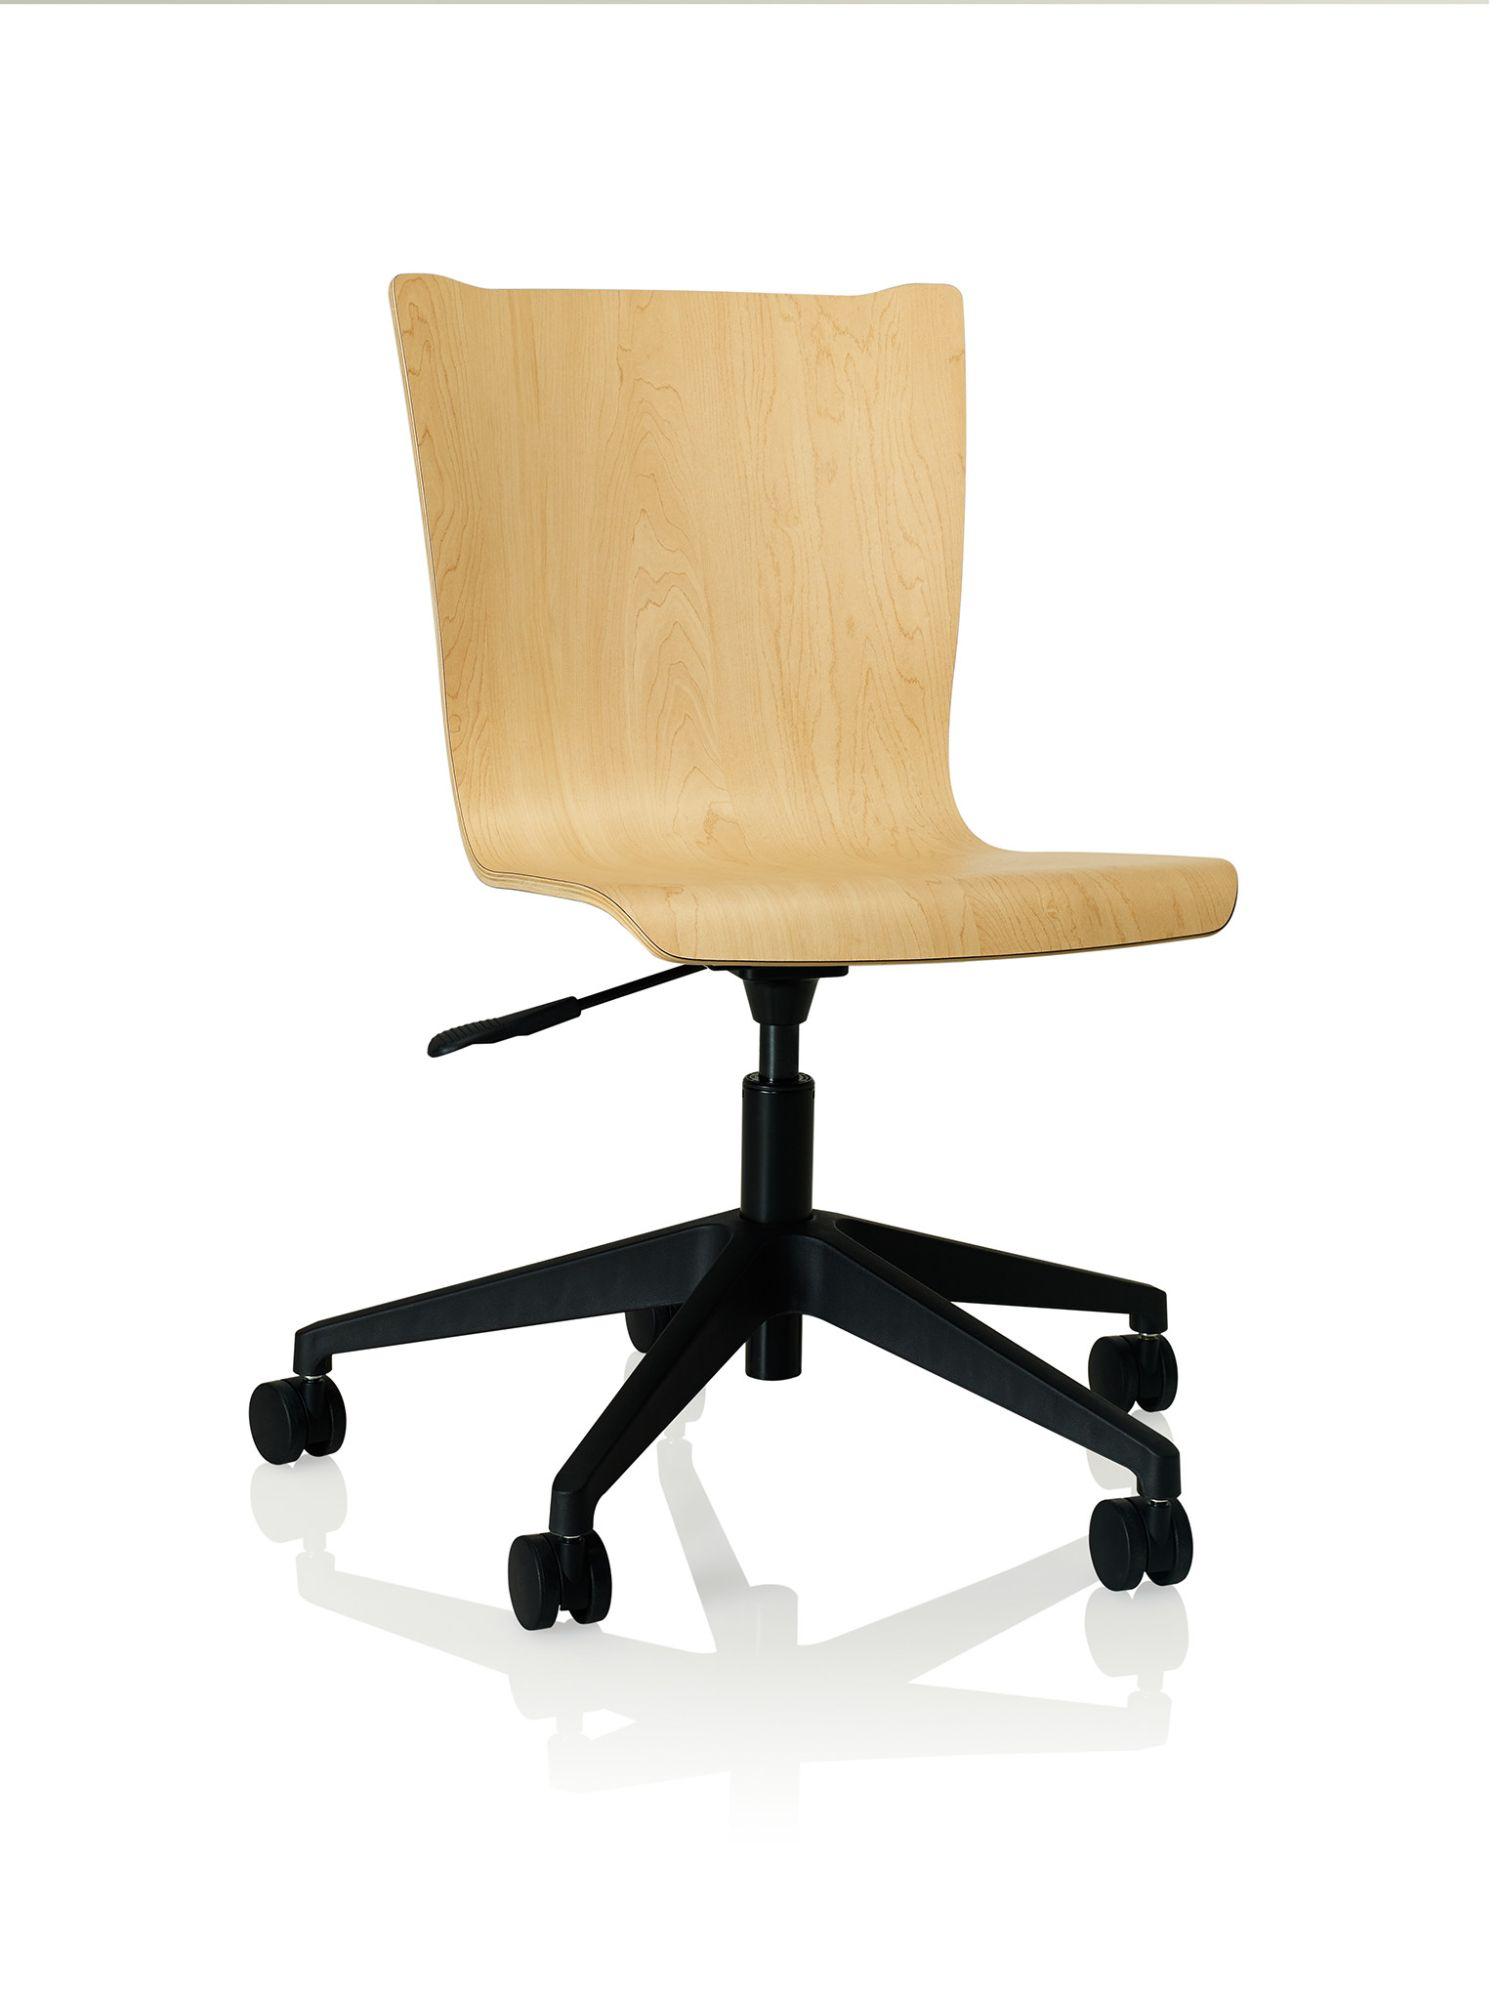 kensington maple apply laminate task chair